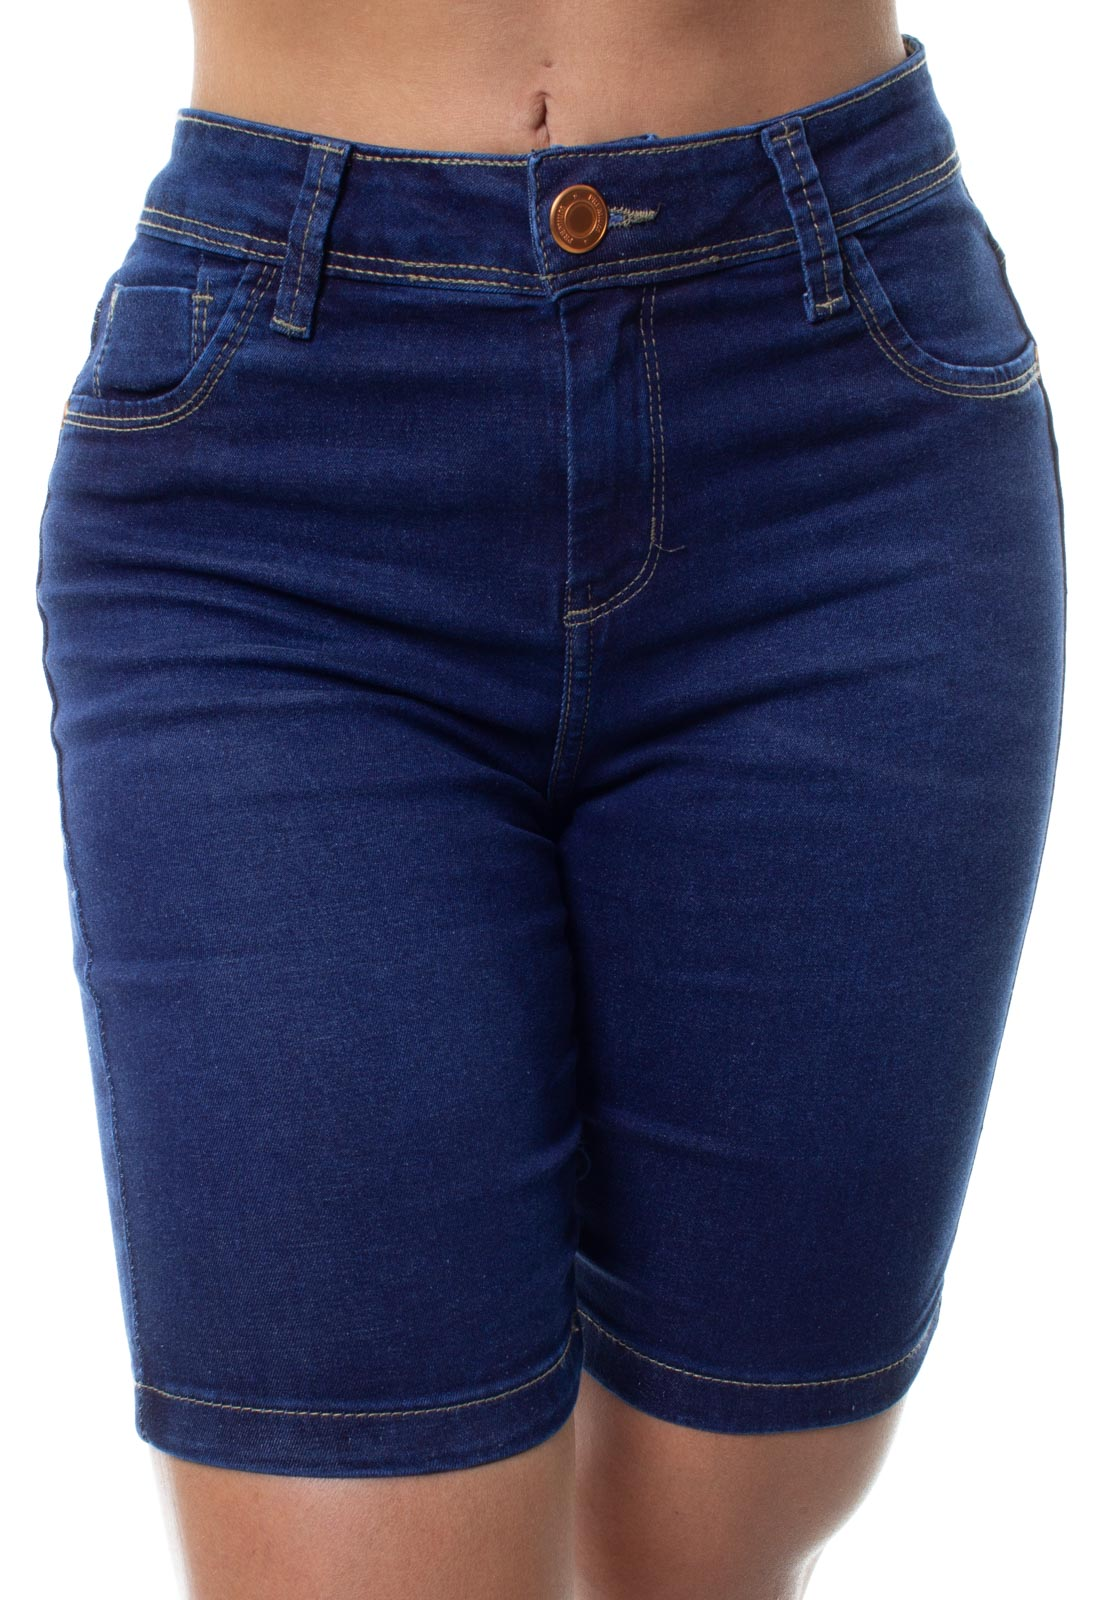 Bermuda Ciclista Jeans Feminina Crocker - 48170  - CROCKER JEANS